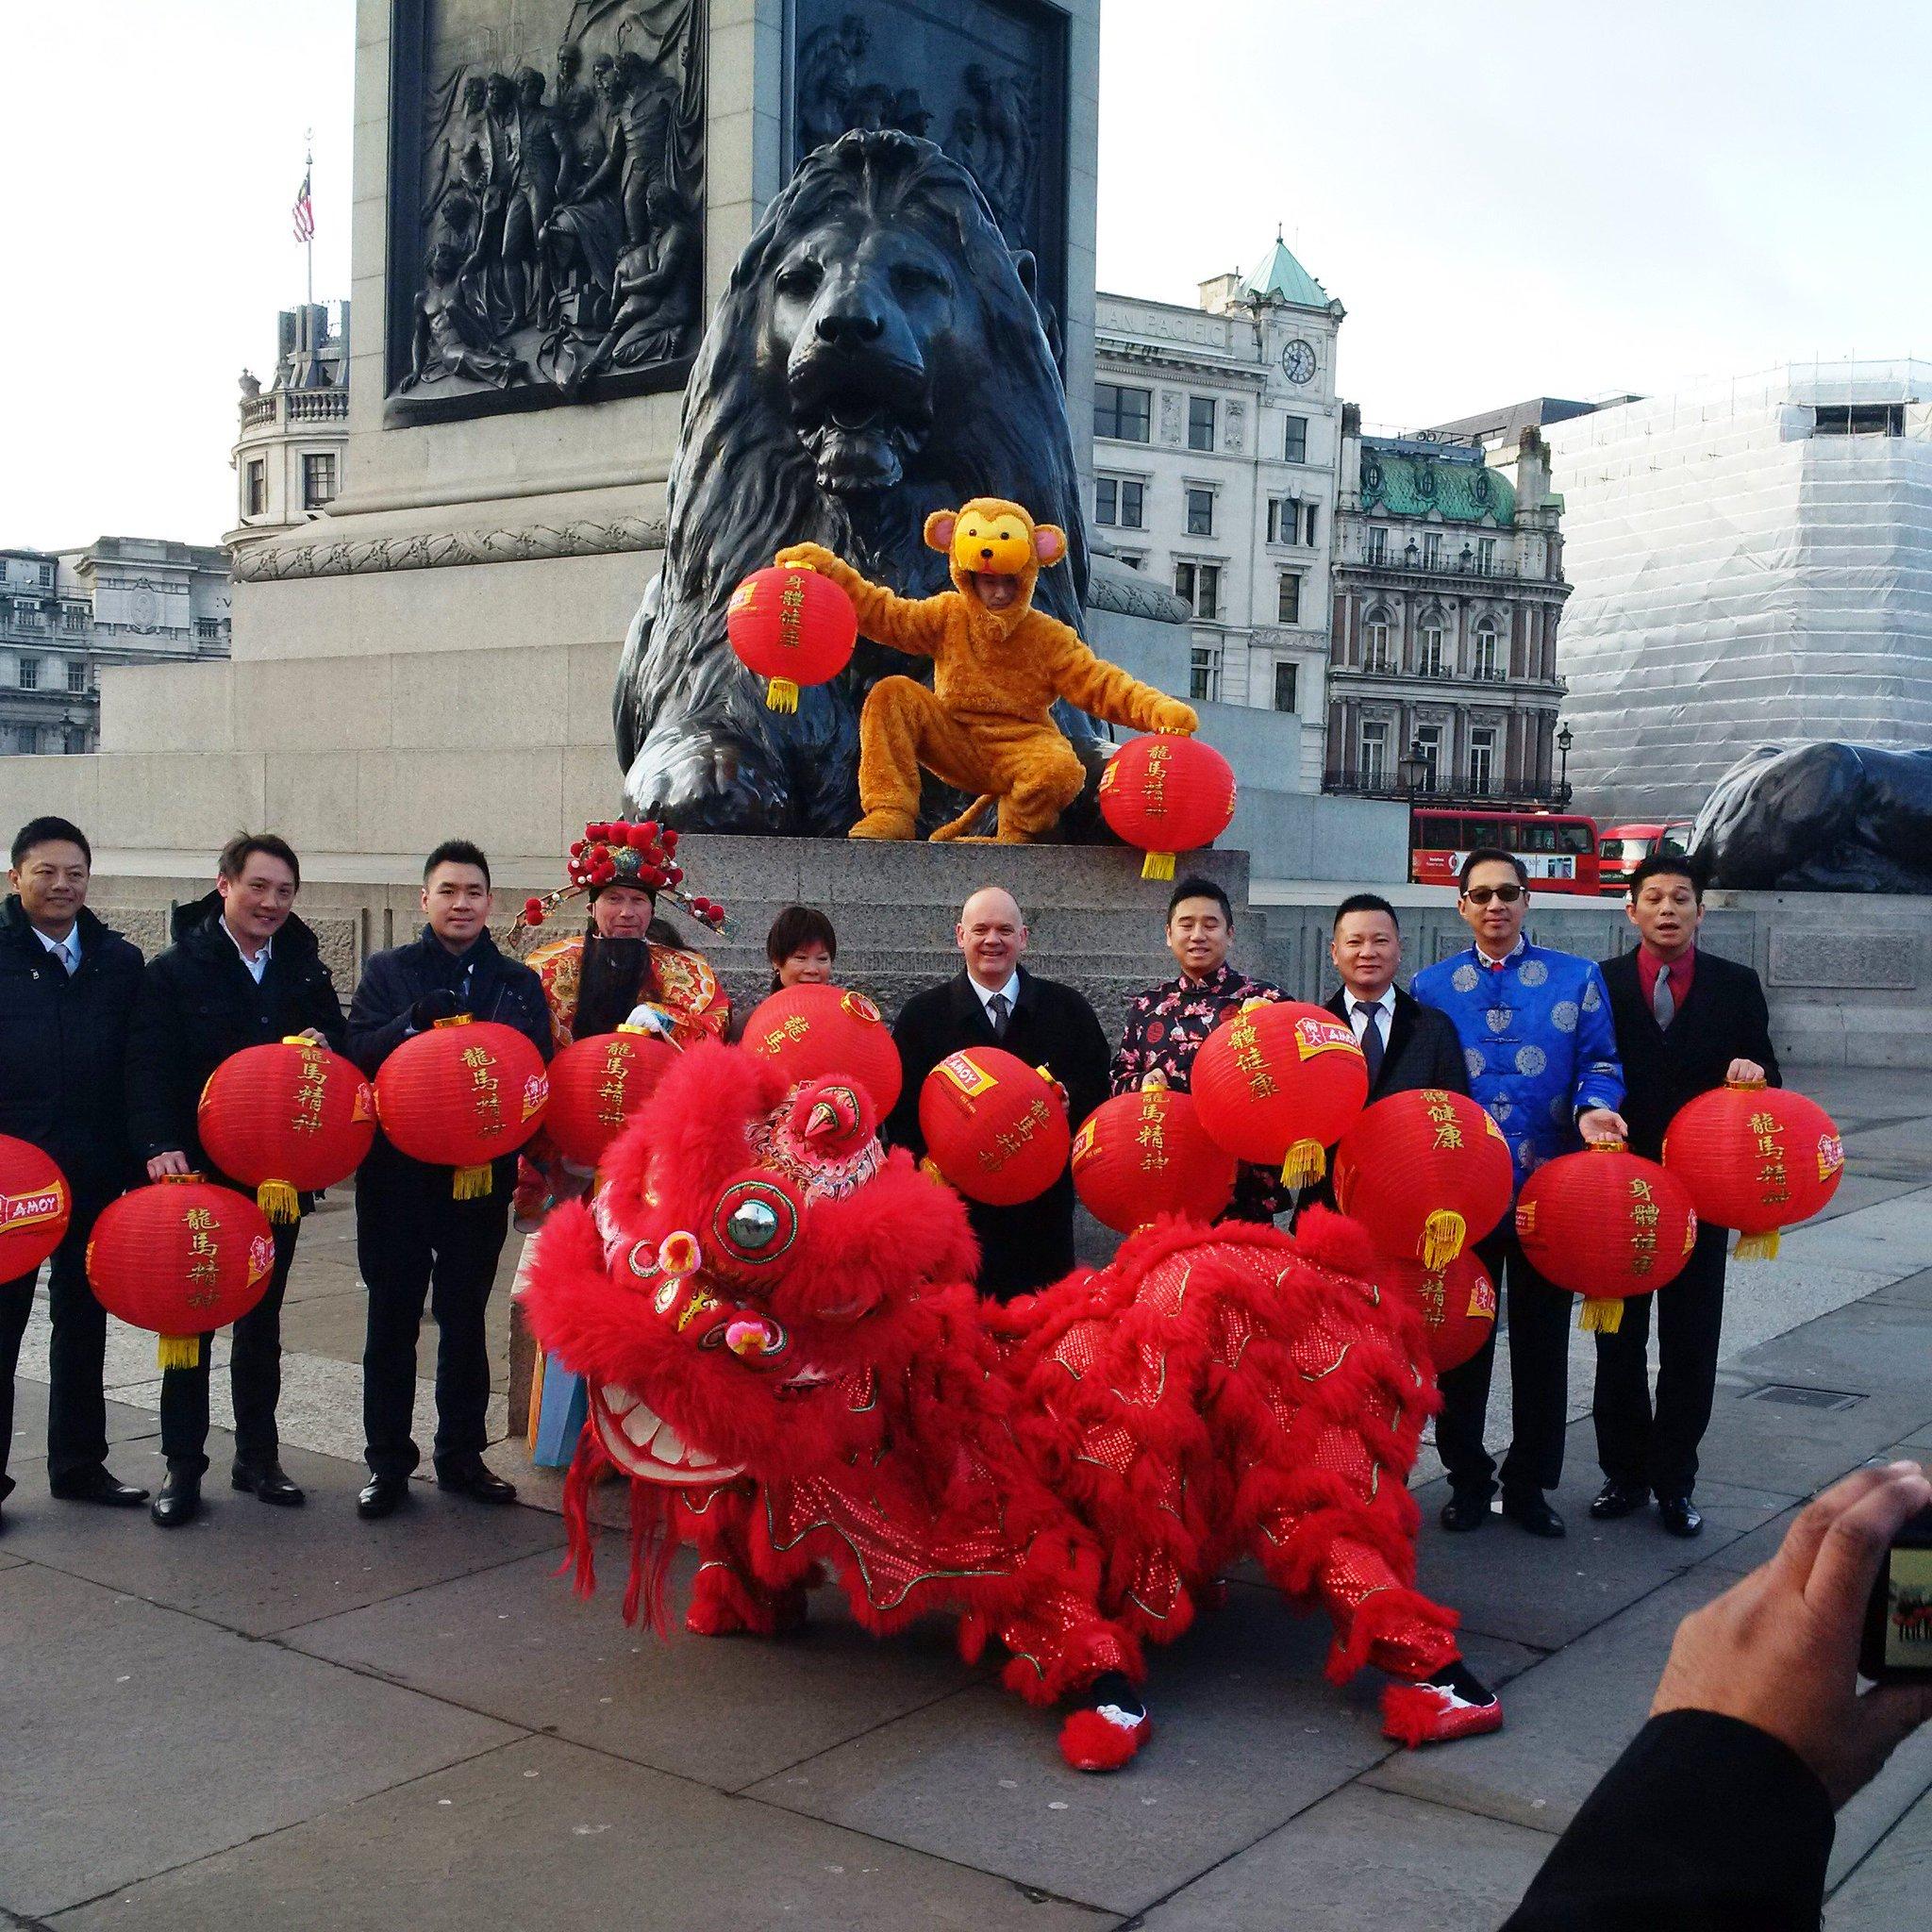 RT @LDN_pressoffice: .@DepMayorLondon and @chinatownldn gearing up for #CNY2016LDN celebrations on Sunday https://t.co/ohDrvshwEc https://t…